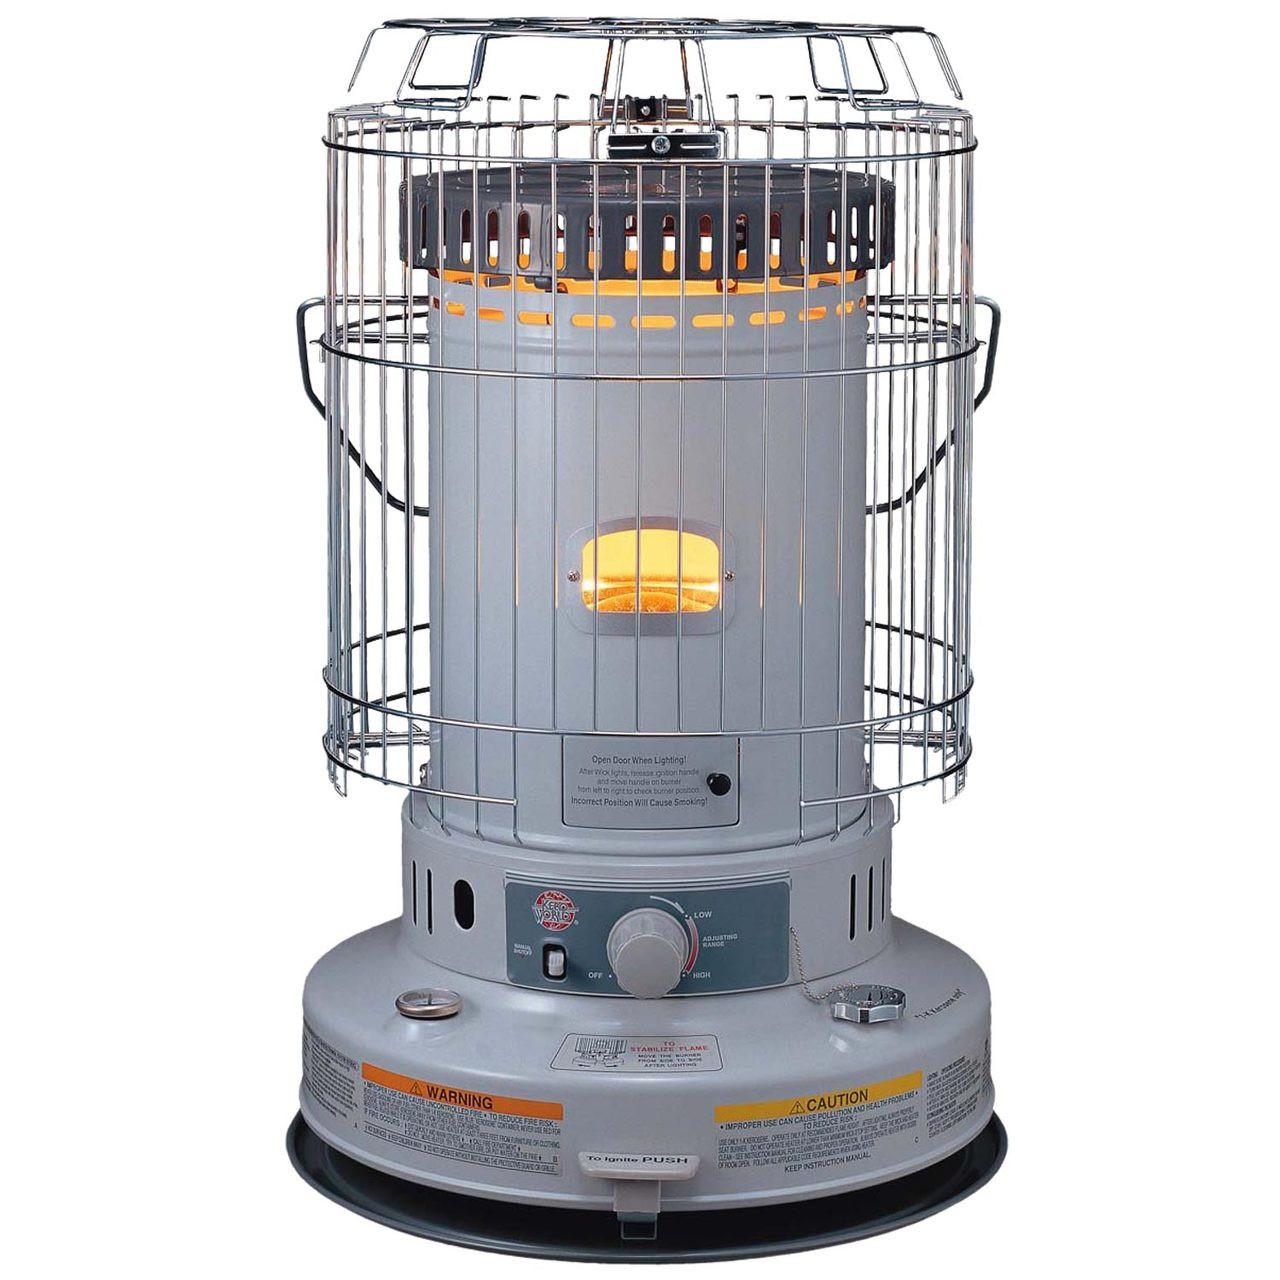 Kero World KW-24G 23,800 Btu Portable Indoor Kerosene Heater ...